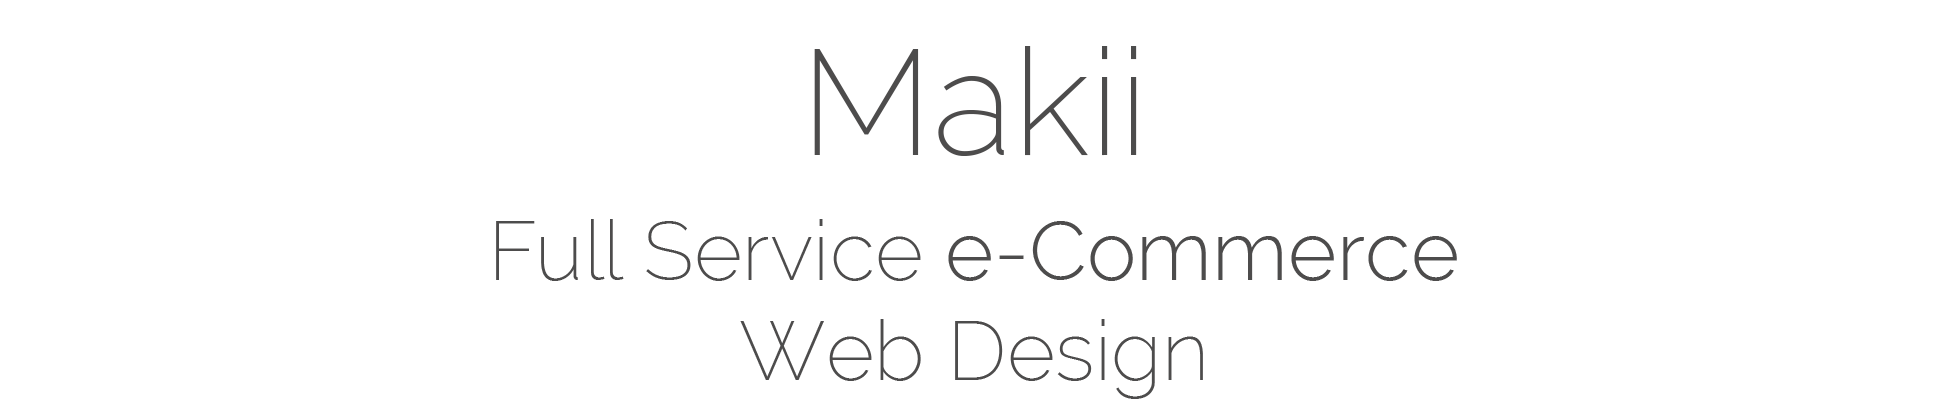 Makii Logo Central Coast Full Service e-Commerce Web Design